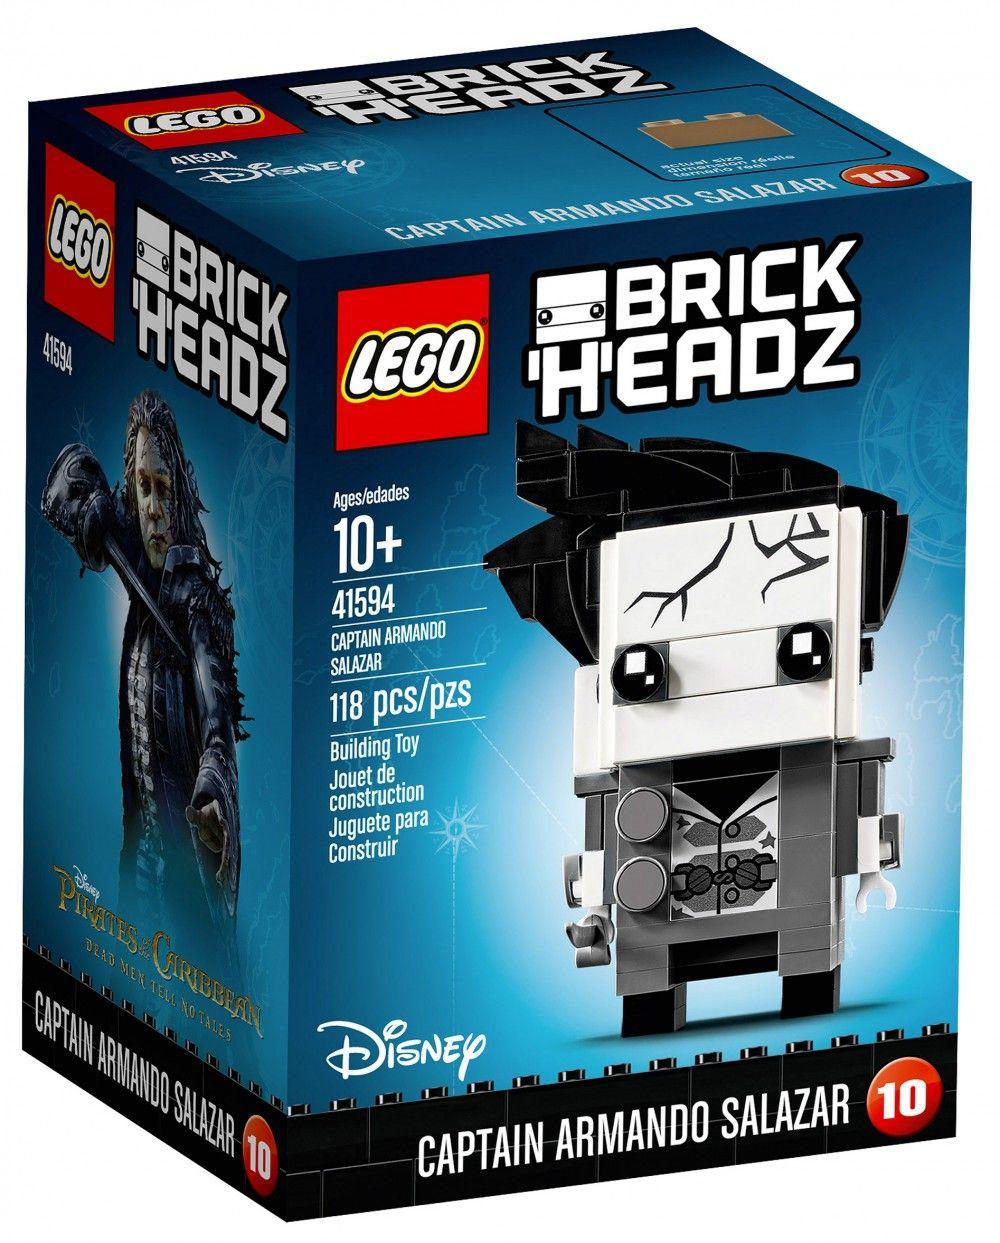 Armando De SalazarGavin Brickheadz Captain Lego 41594 Magasin FJTc3lK1